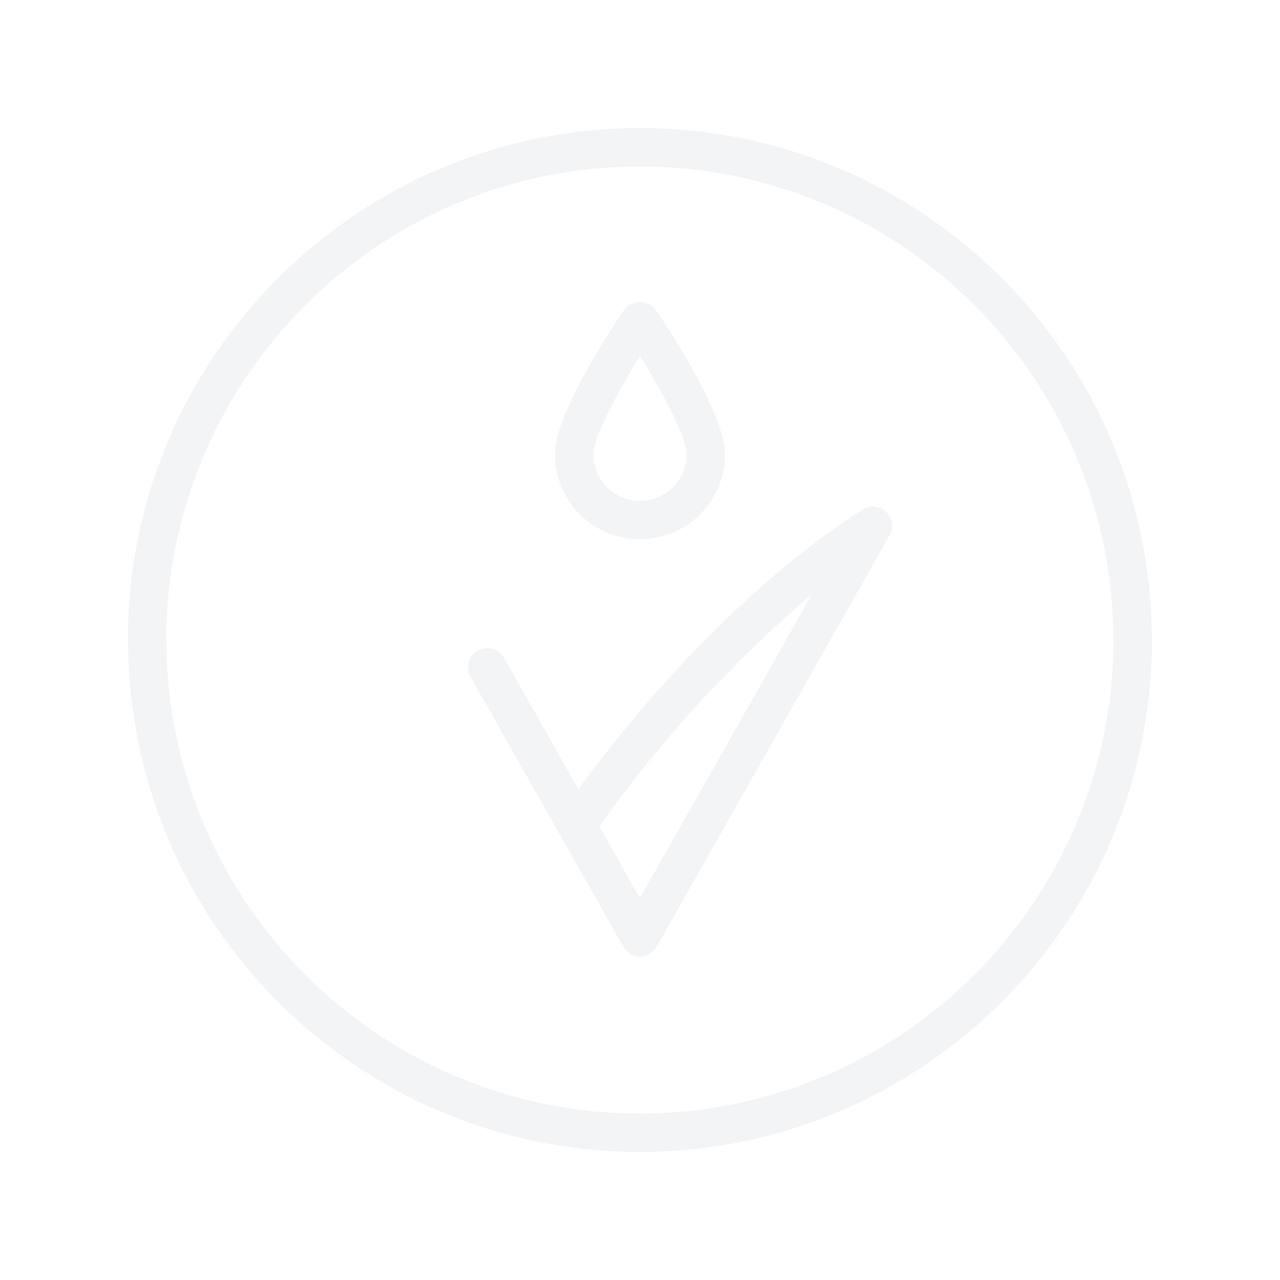 BIOKAP Nutricolor Delicato 5.34 Permanent Hair Dye 140ml